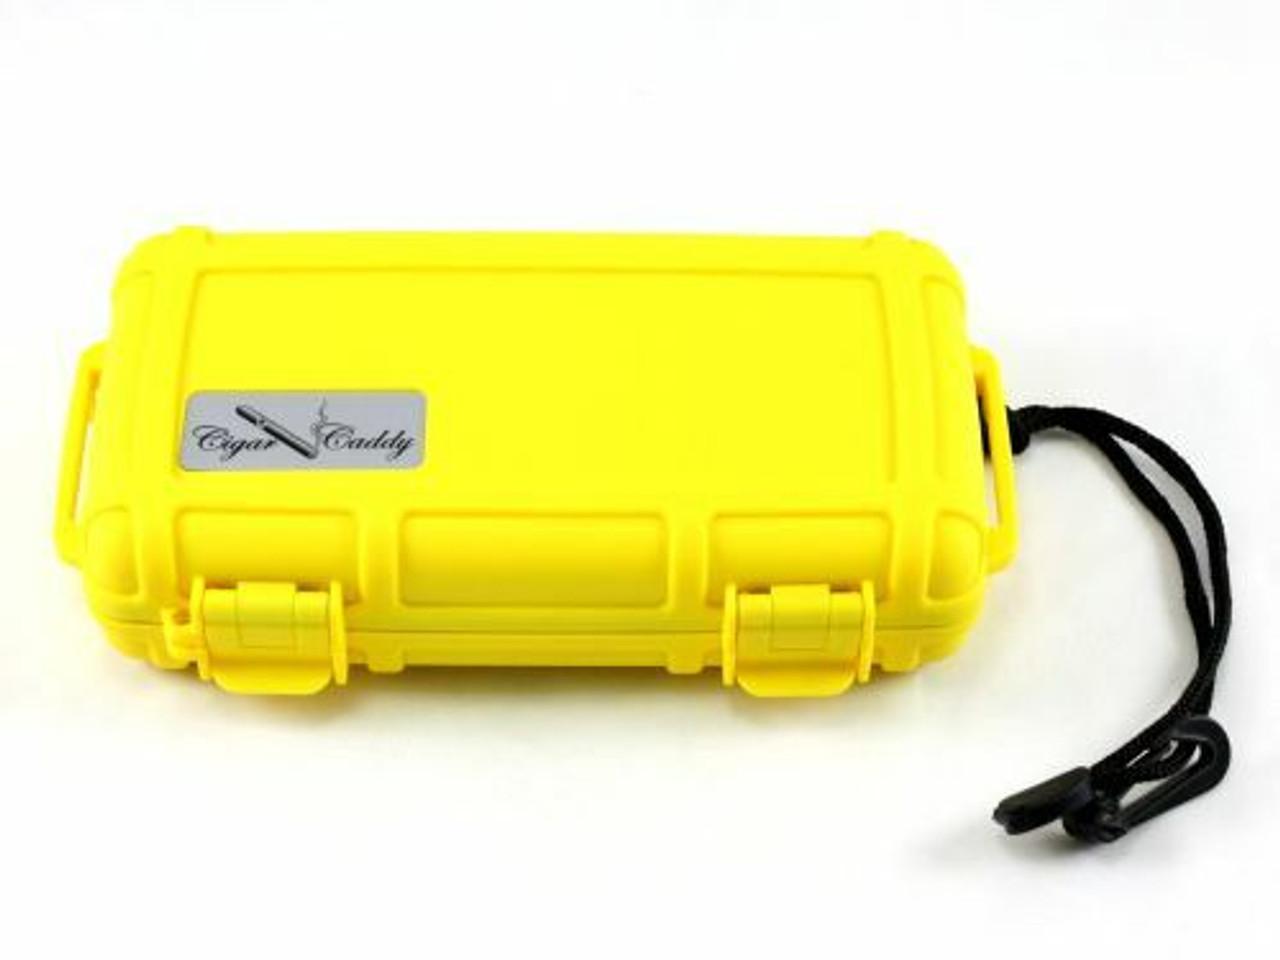 Cigar Caddy - Bright Yellow 5 Cigar Travel Humidor